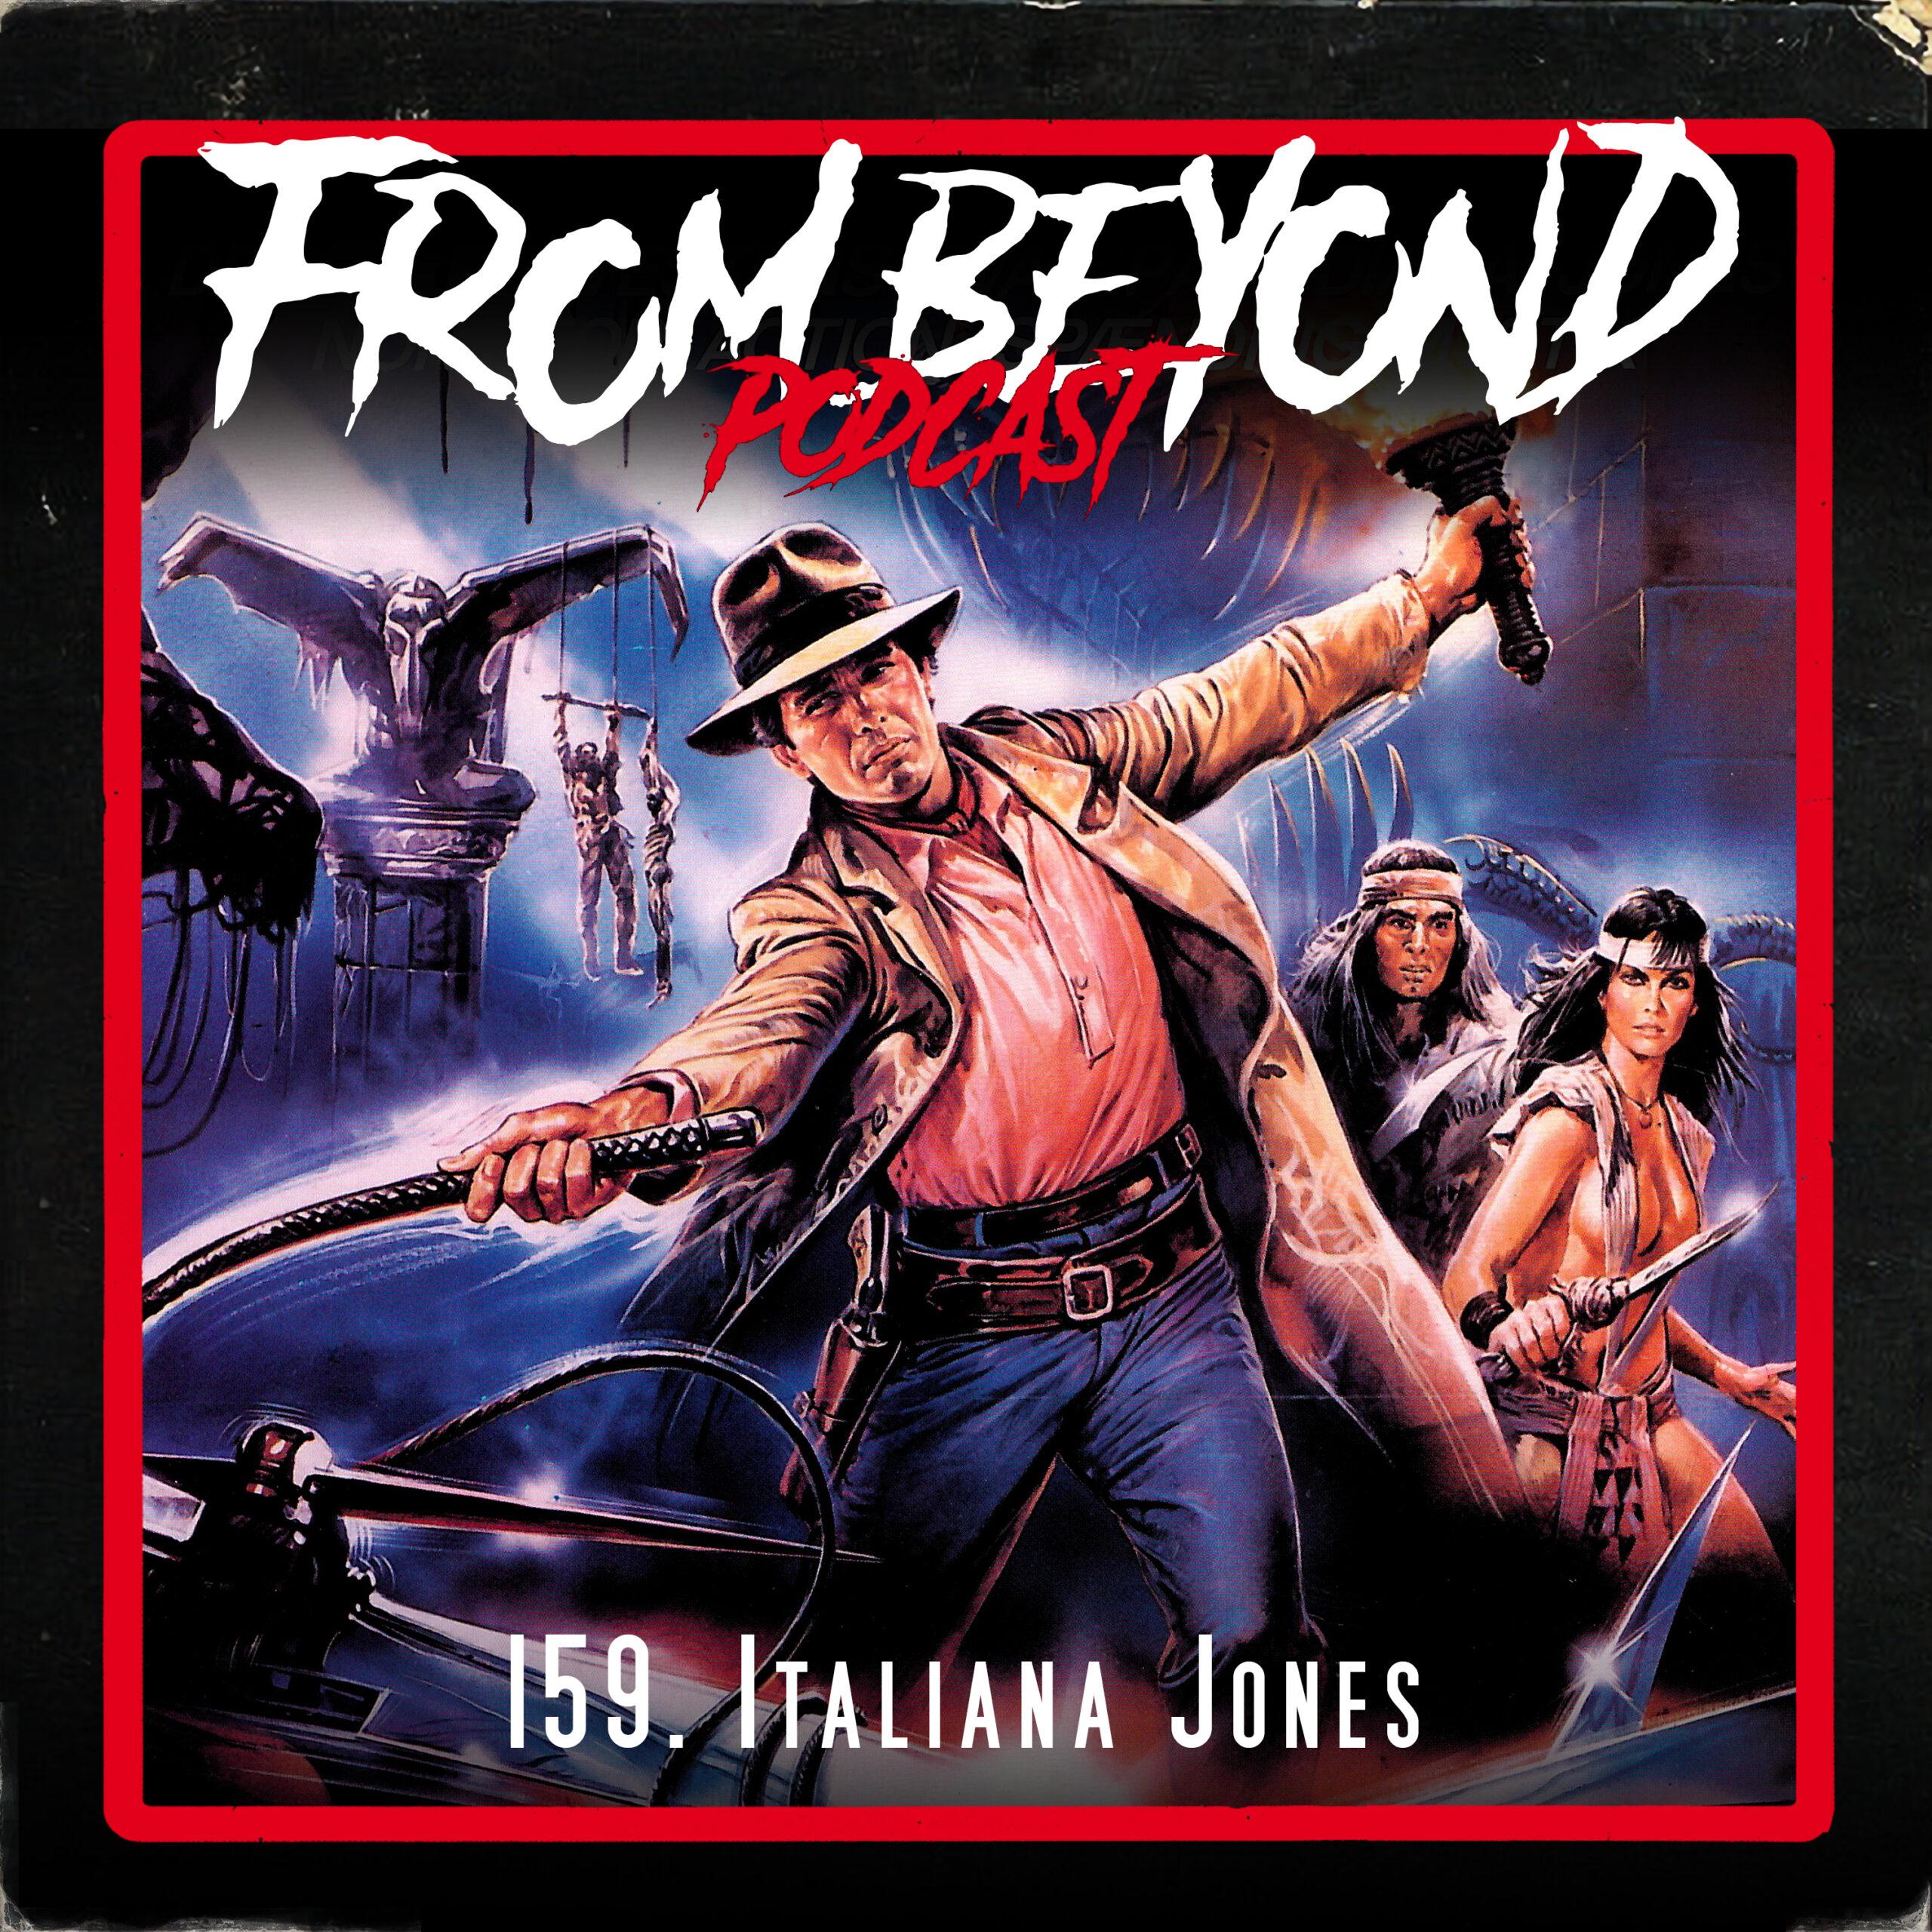 #159 – Italiana Jones